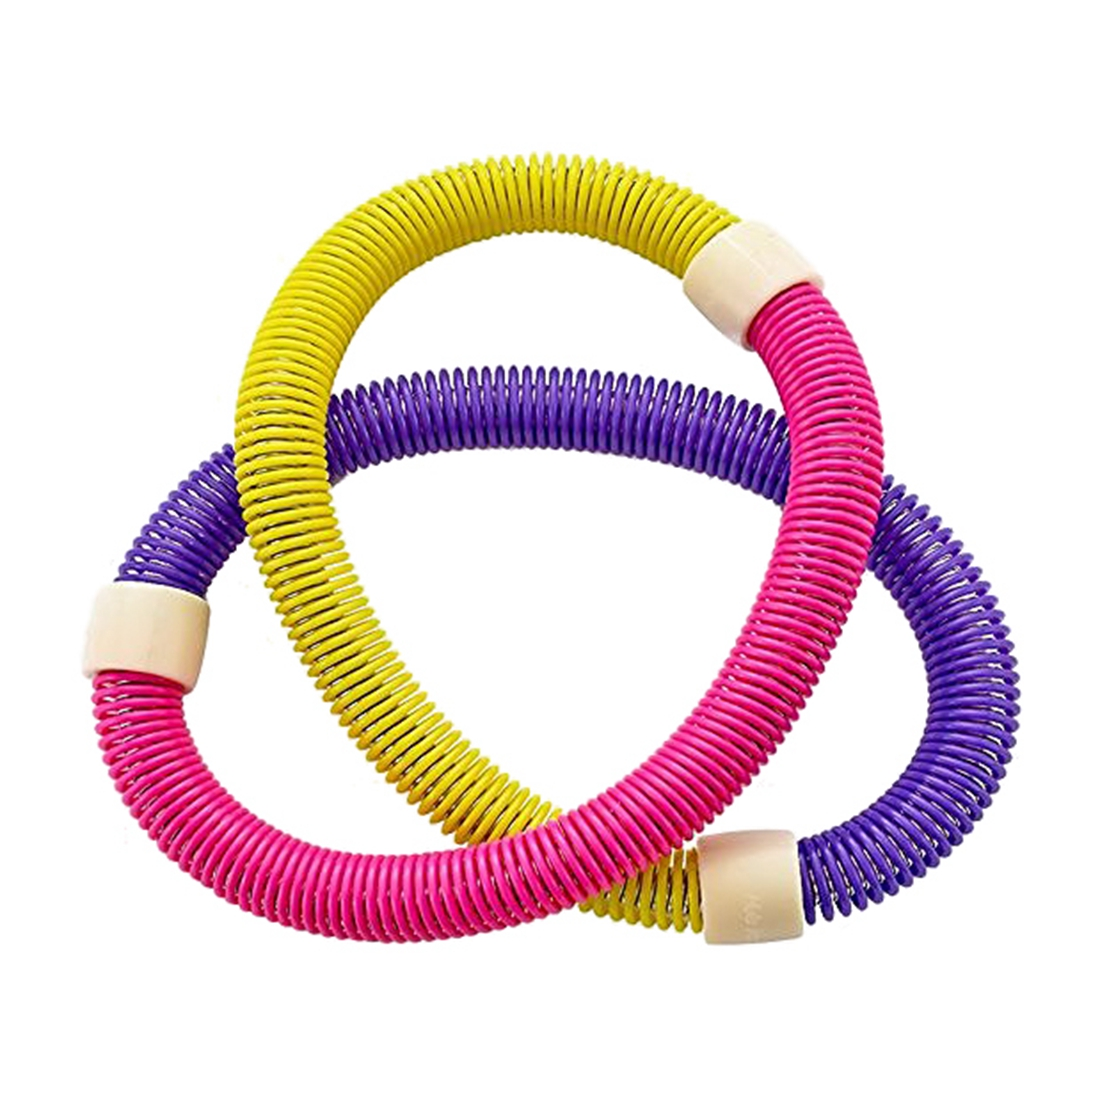 hula hoop reifen fitnessreifen bauchtrainer reifen mit. Black Bedroom Furniture Sets. Home Design Ideas